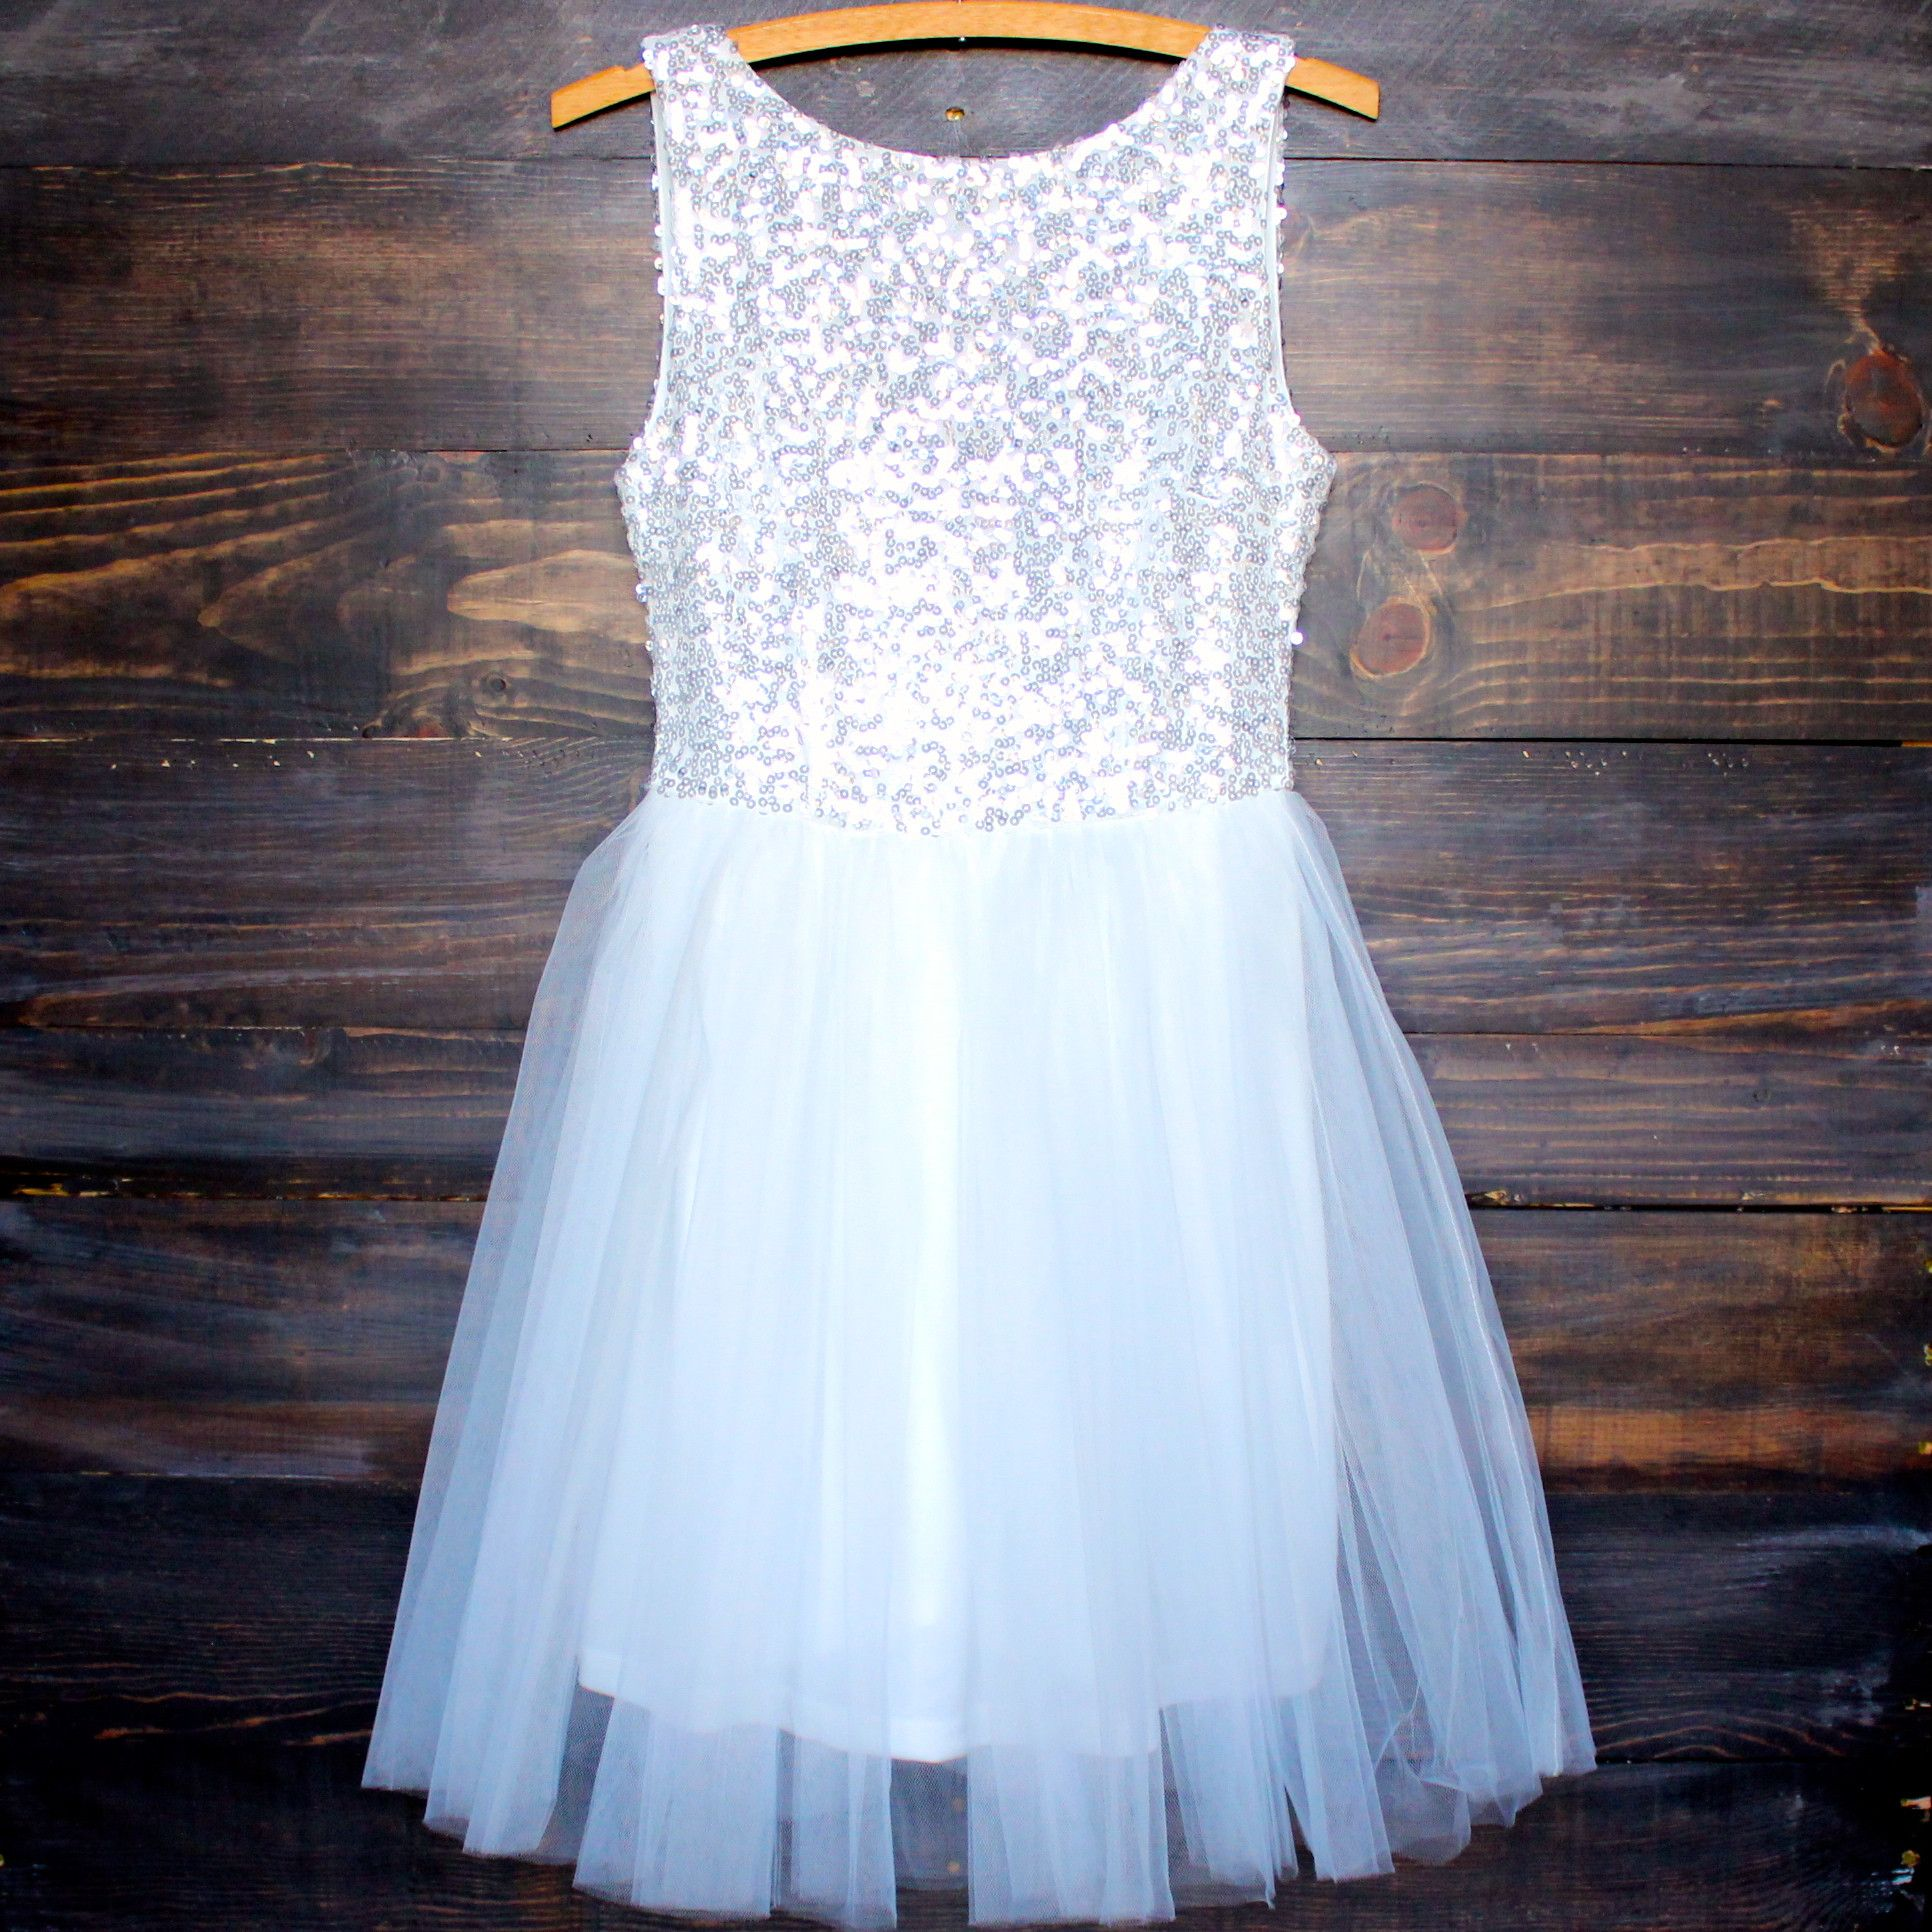 Sugar Plum Dazzling White Sequin Darling Party Dress Dance Shops